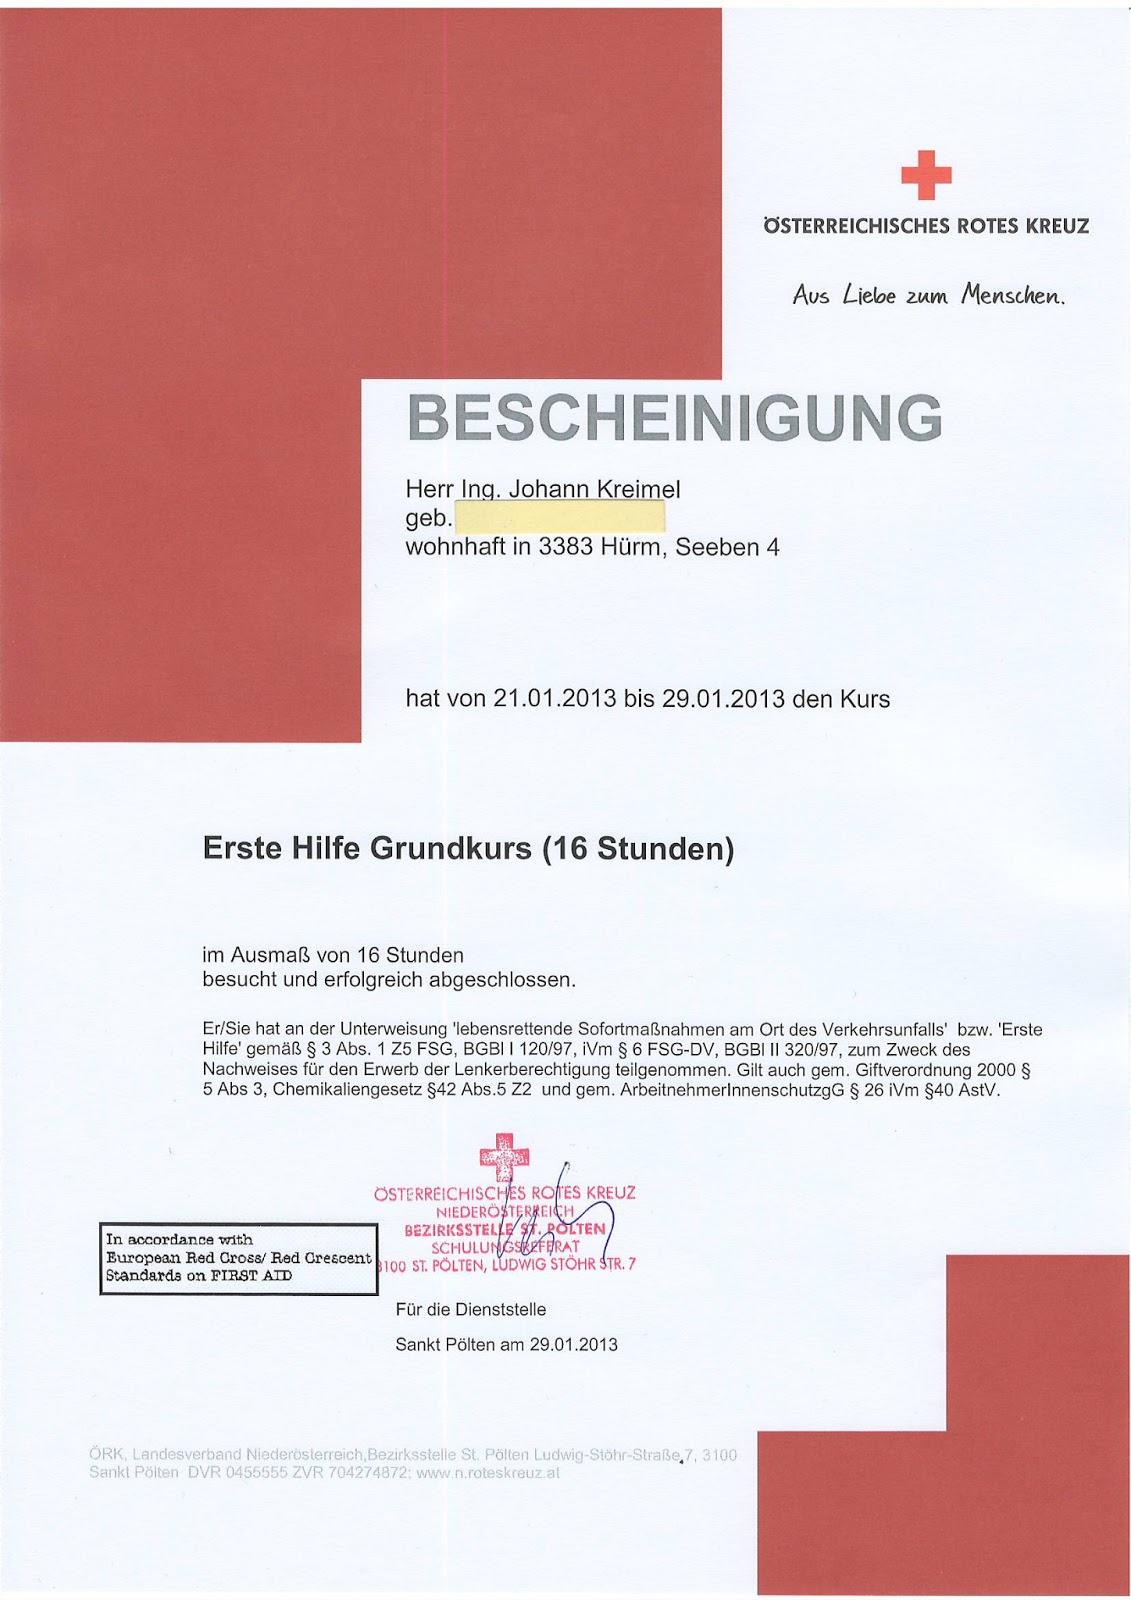 Tolle Erste Hilfe Zertifikat Vorlage Ideen - Entry Level Resume ...